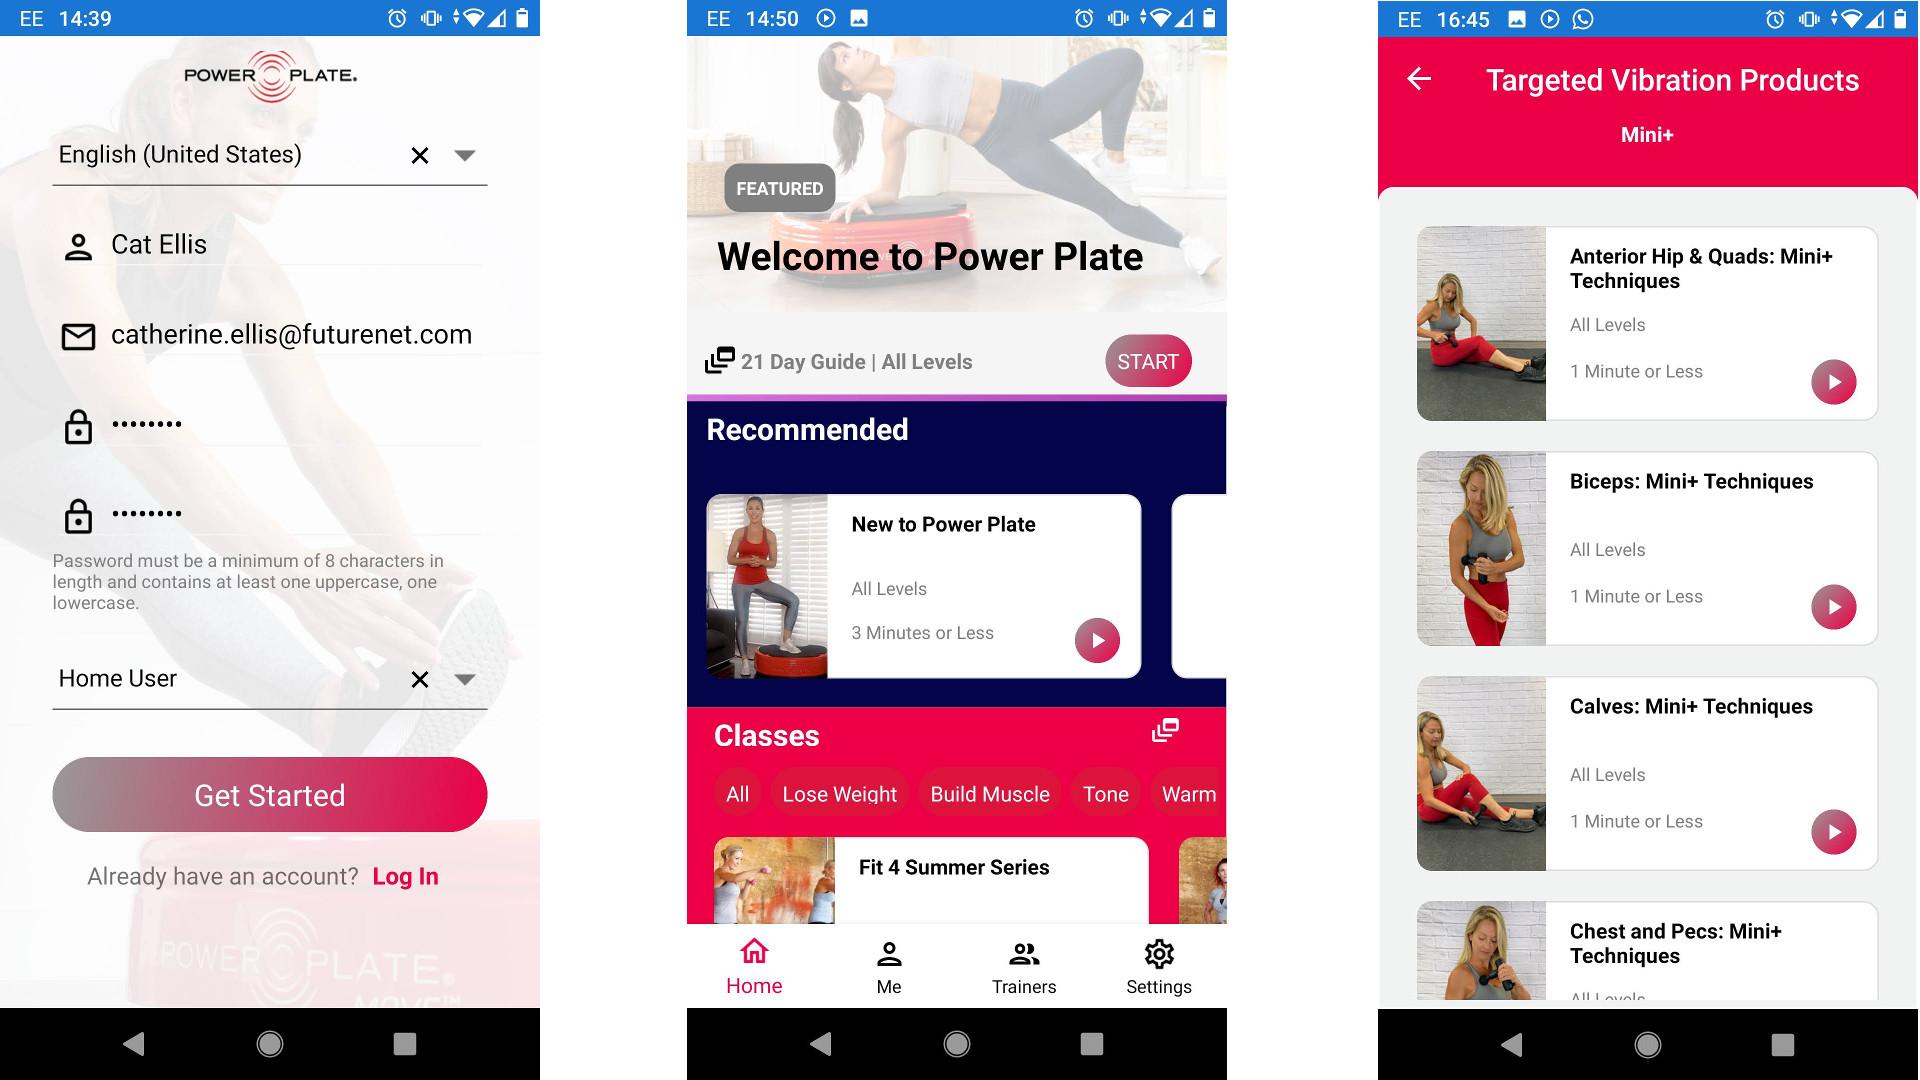 Power Plate mobile app screengrabs